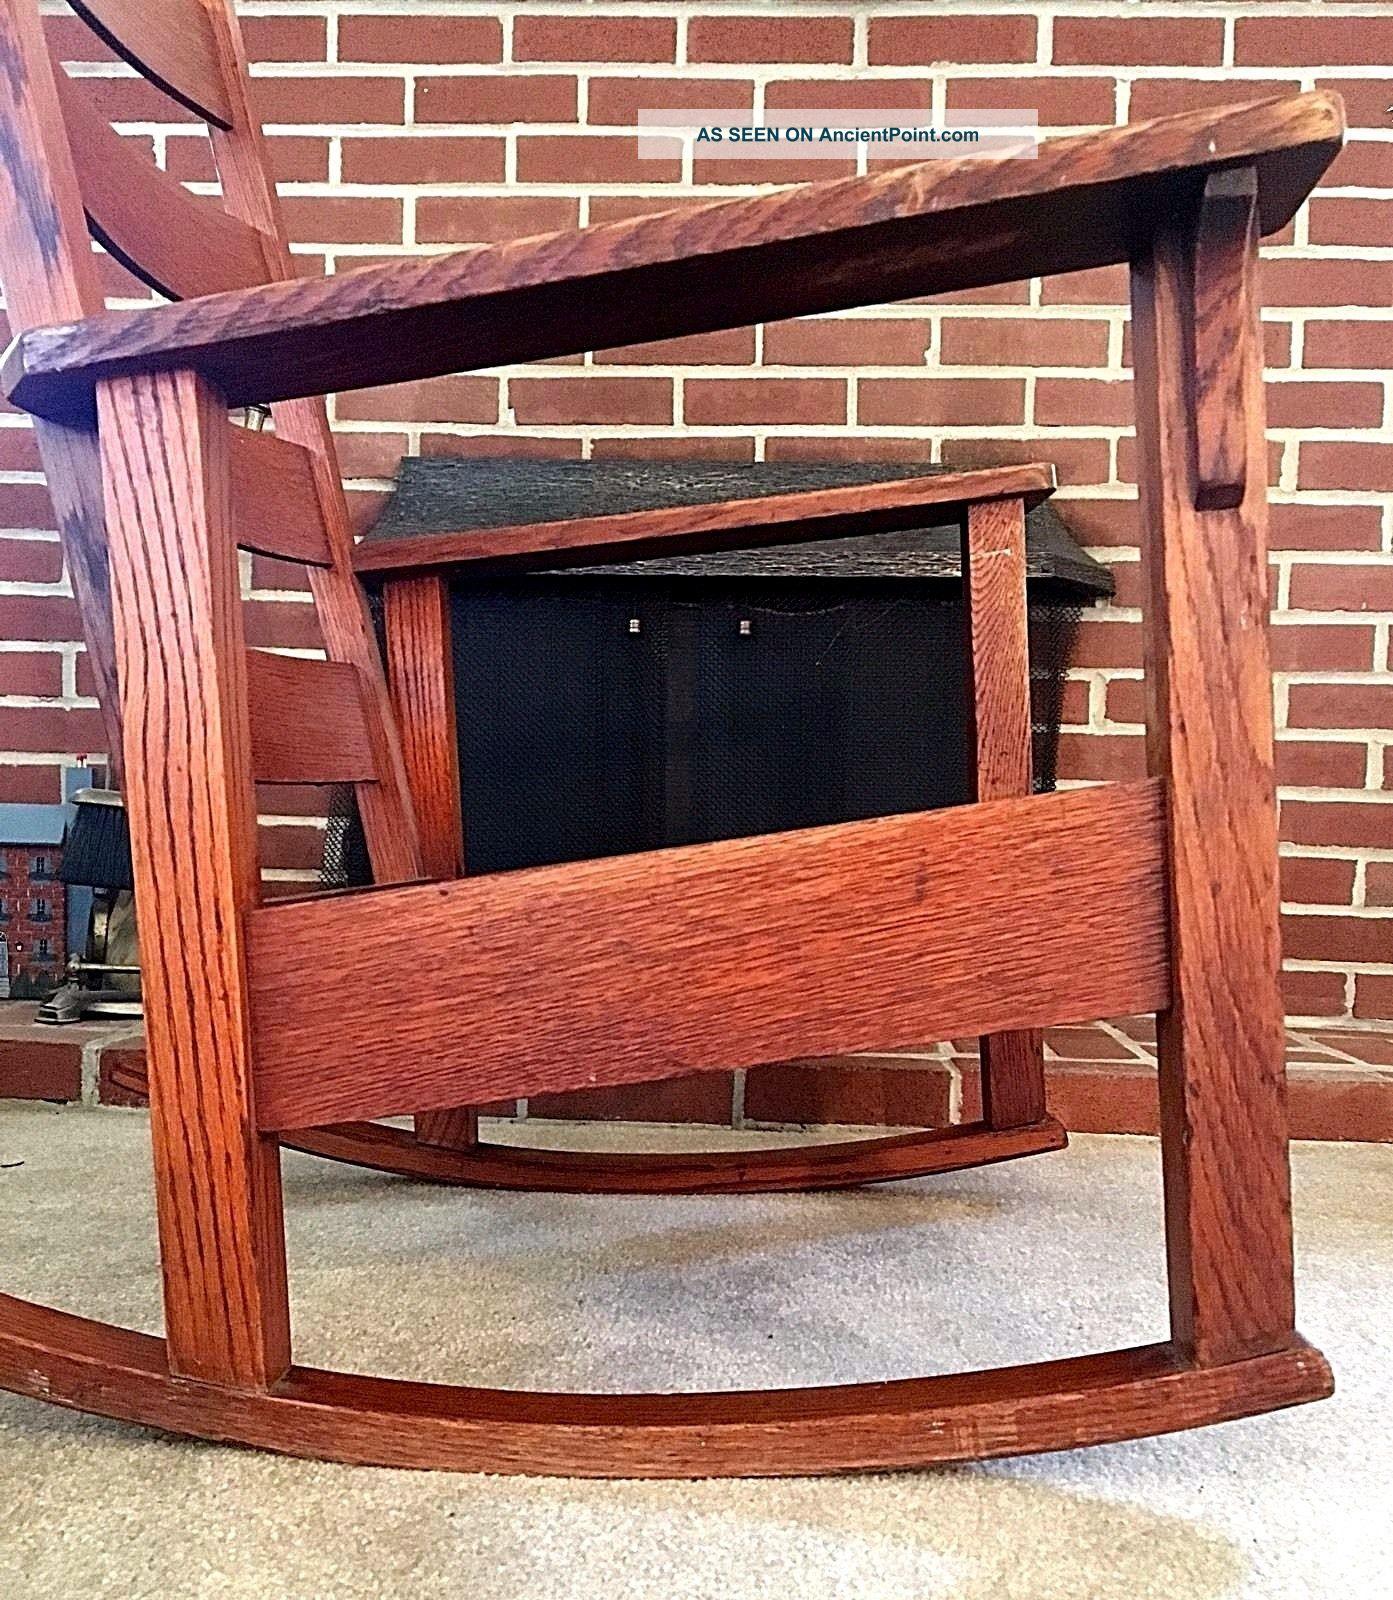 Antique Stickley Rocking Chair Quaint 1902 Arts & Crafts